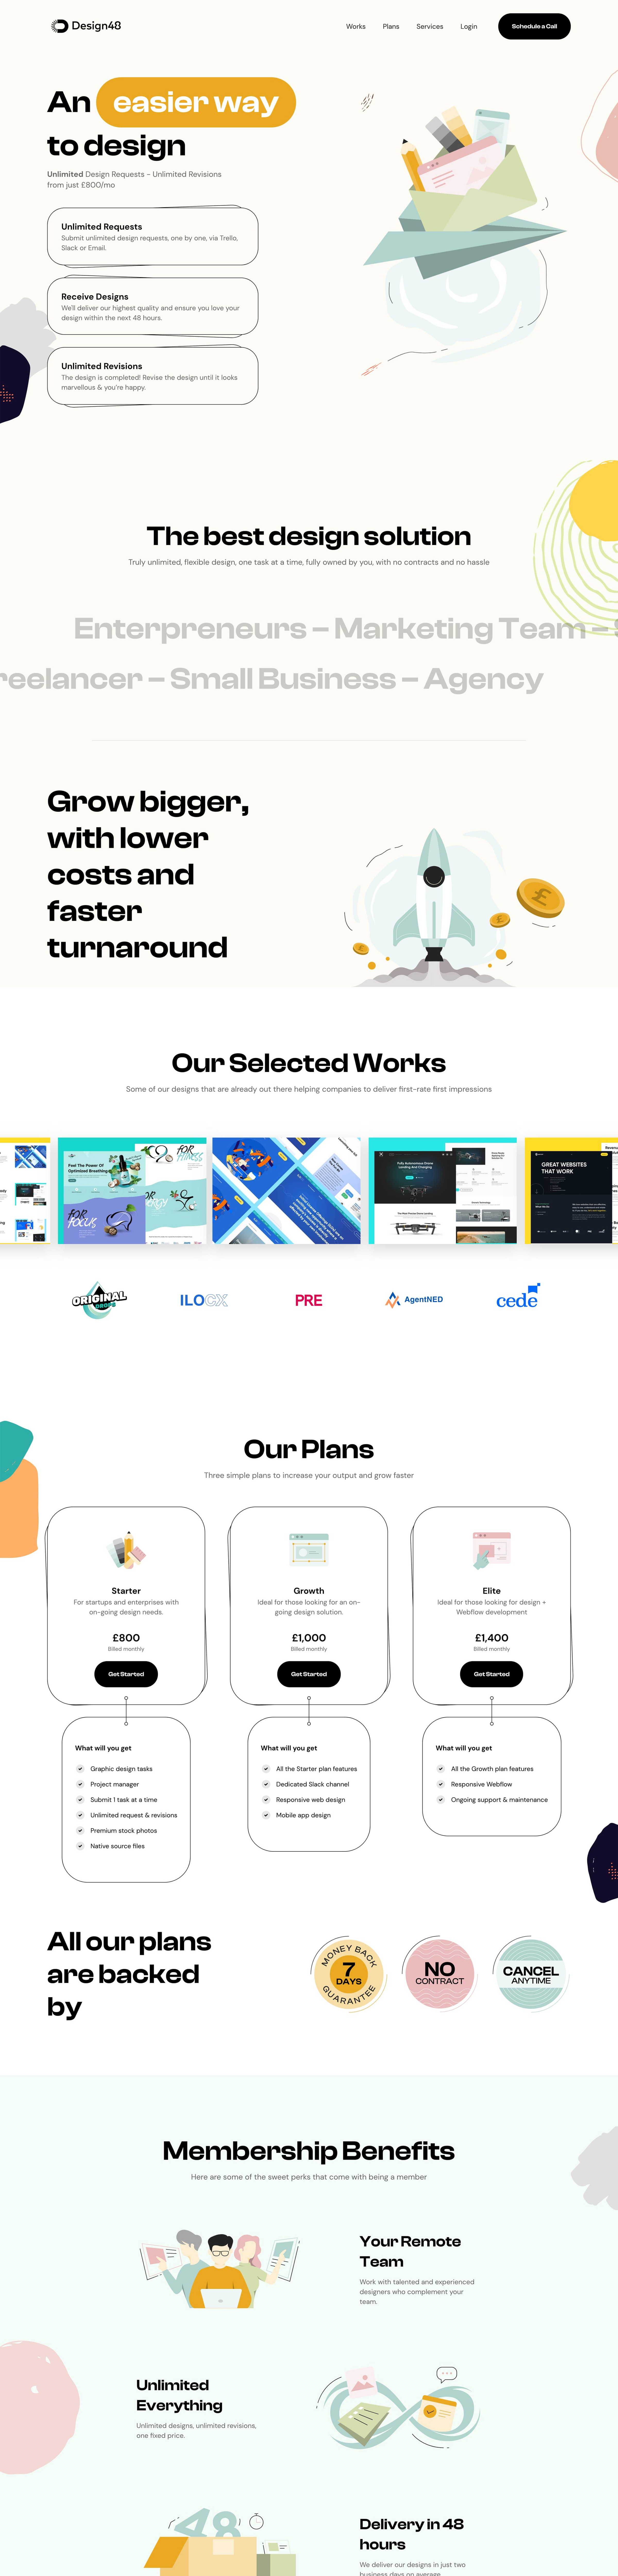 Design48 Website Screenshot